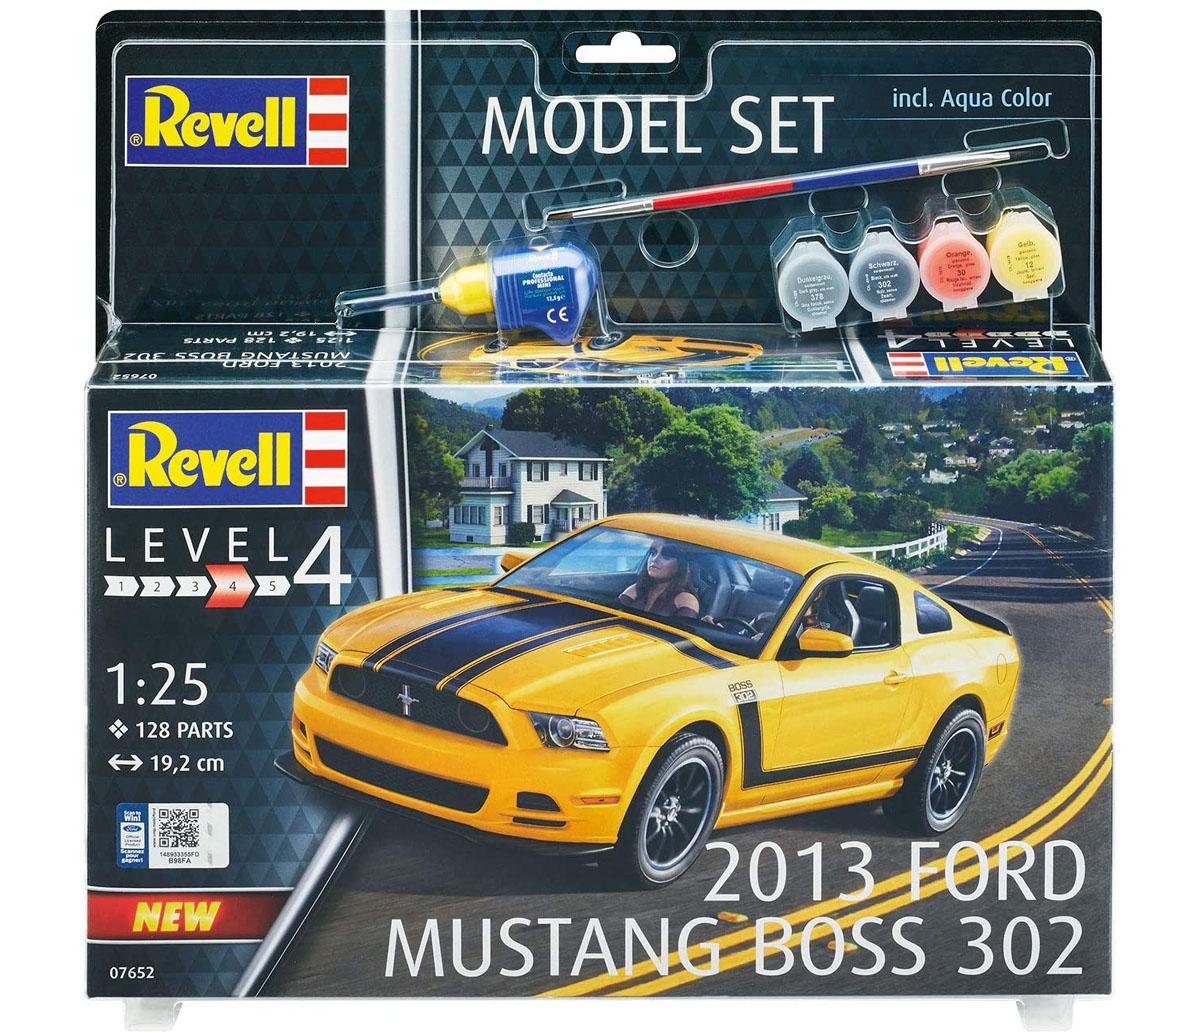 Model Set Ford Mustang Boss 302 2013 - 1/25 - Revell 67652  - BLIMPS COMÉRCIO ELETRÔNICO